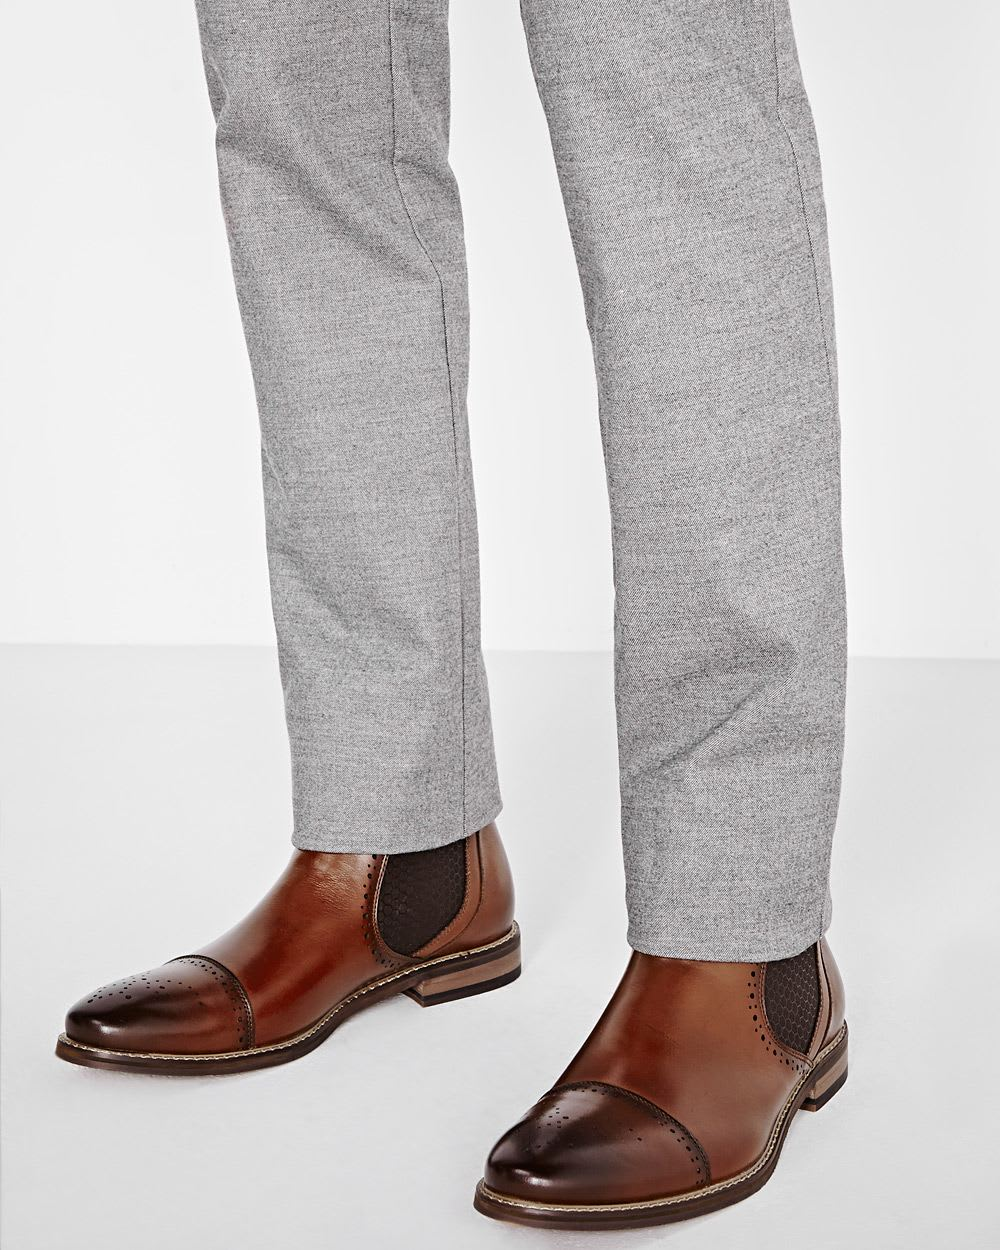 Rw Men S Shoes Boot